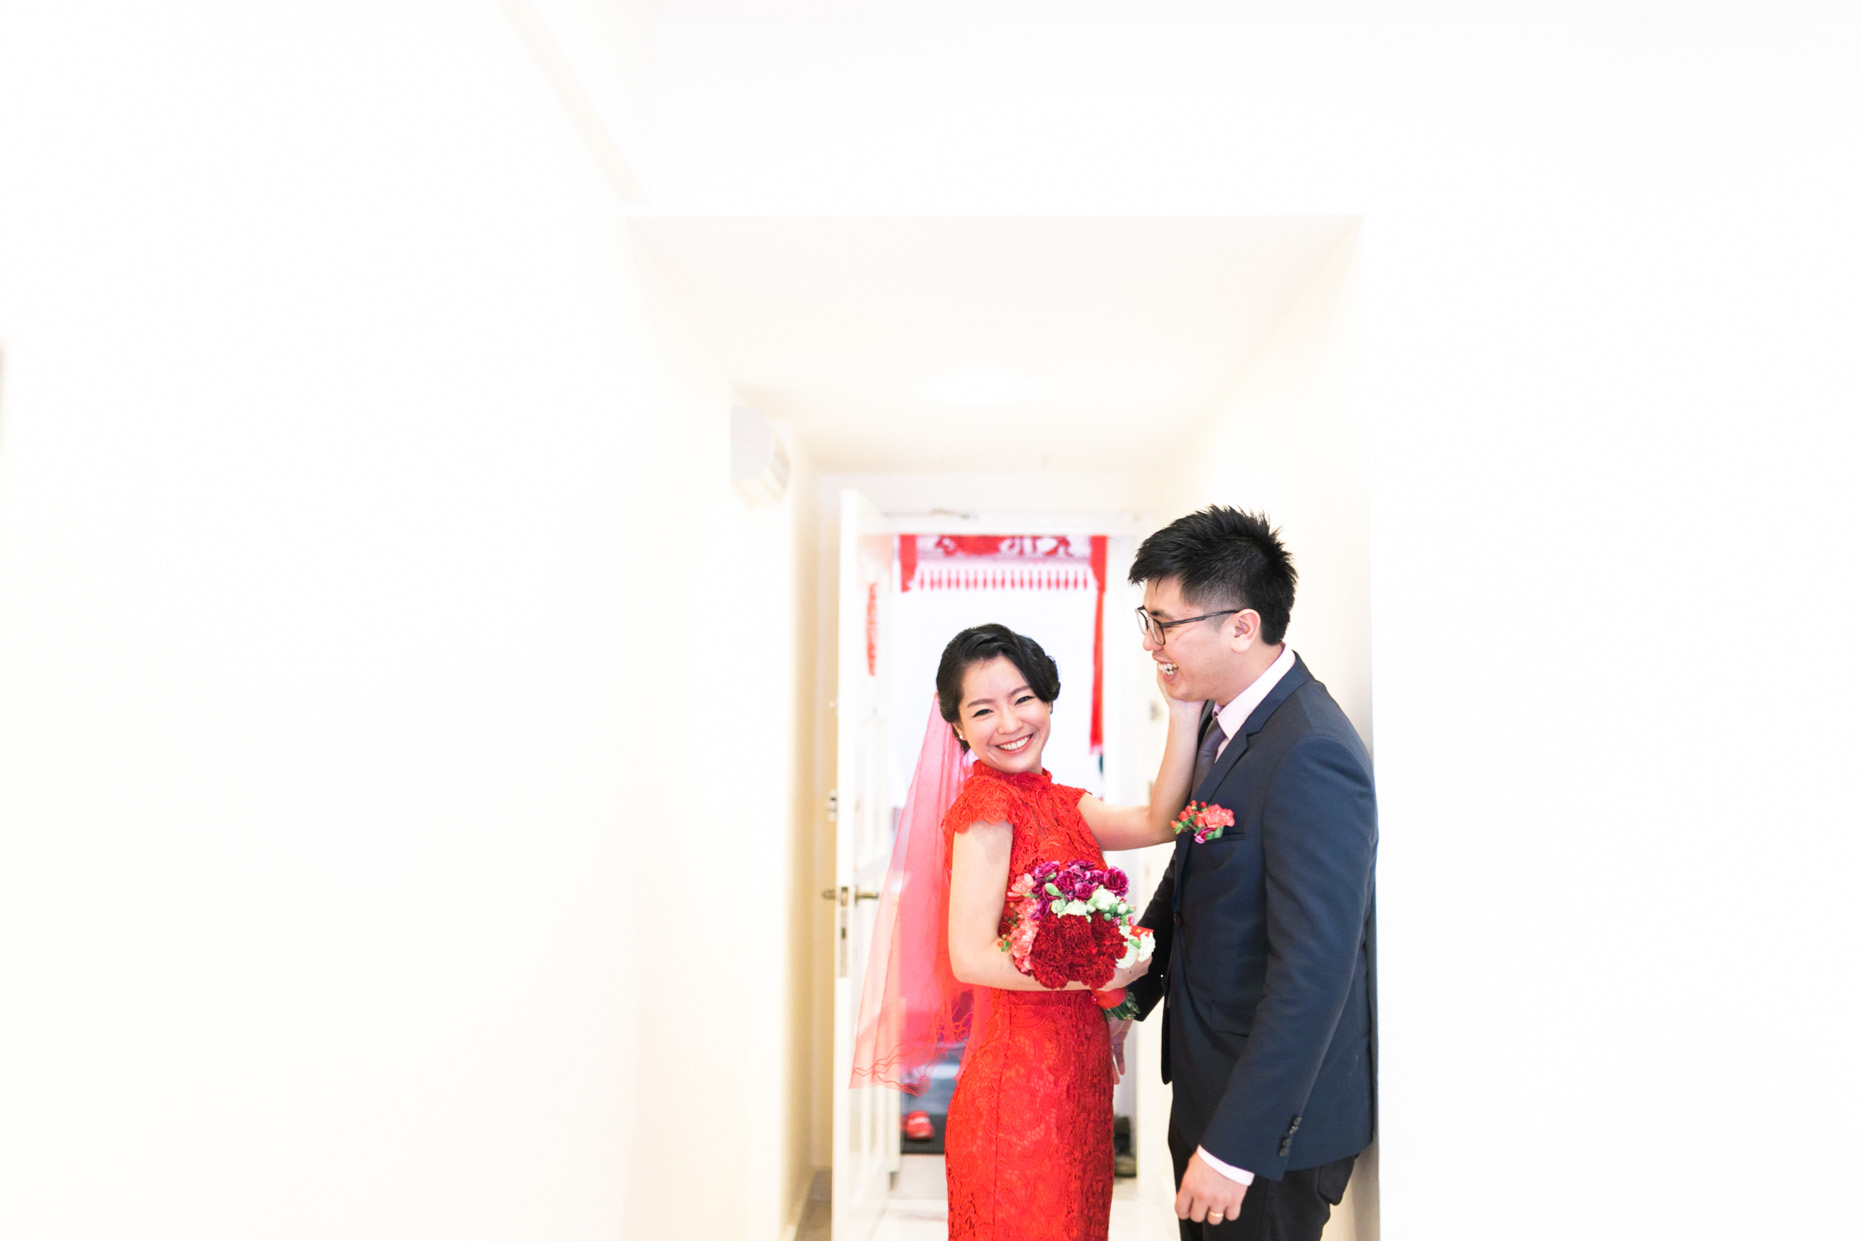 83-hellojanelee-malaysia-wedding-photographer-lake-garden-tinajackson-prewedding